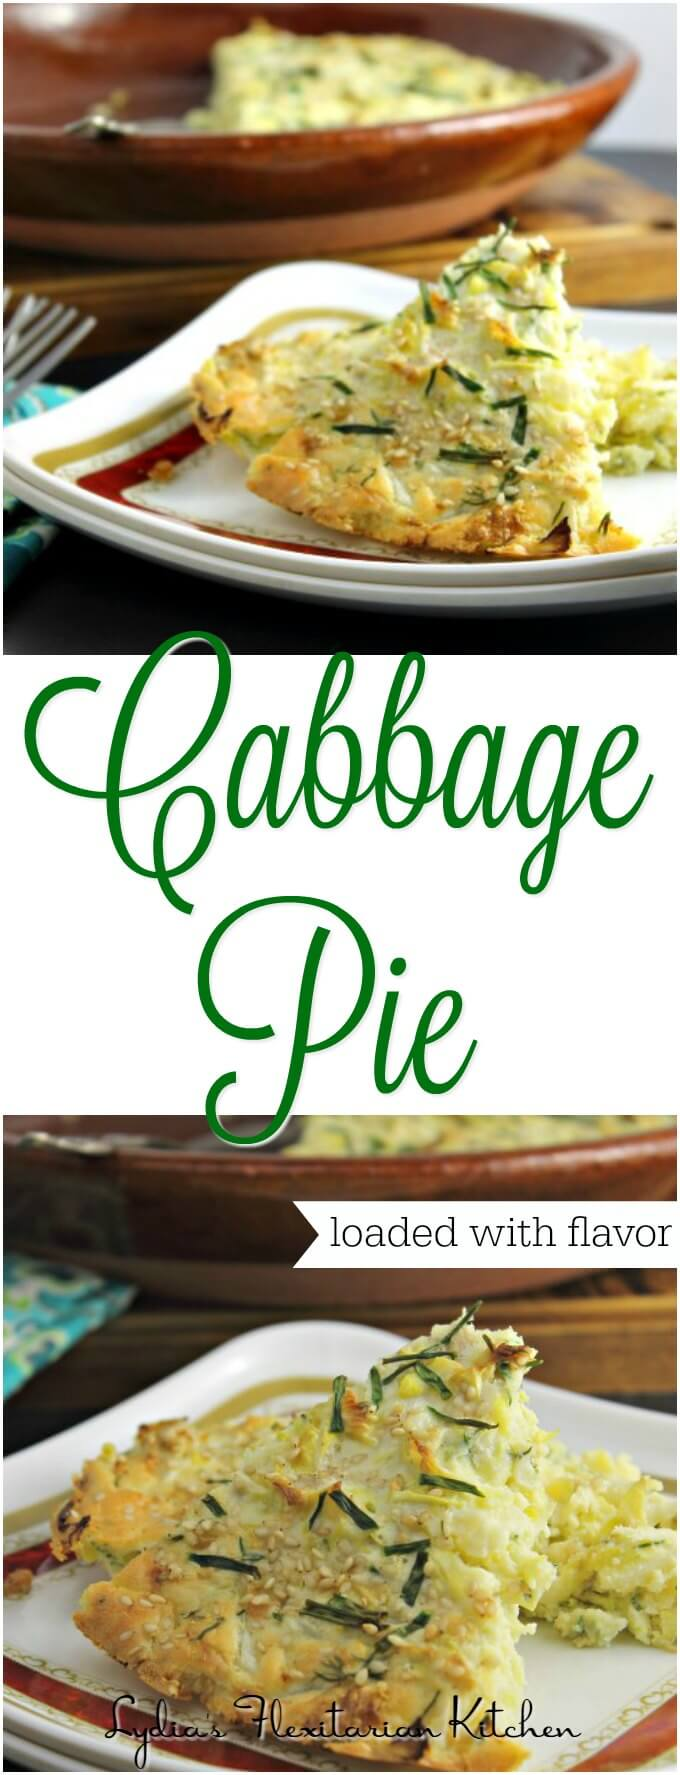 Cabbage Pie ~ #FoodOfTheWorld Russia ~ Lydia's Flexitarian Kitchen